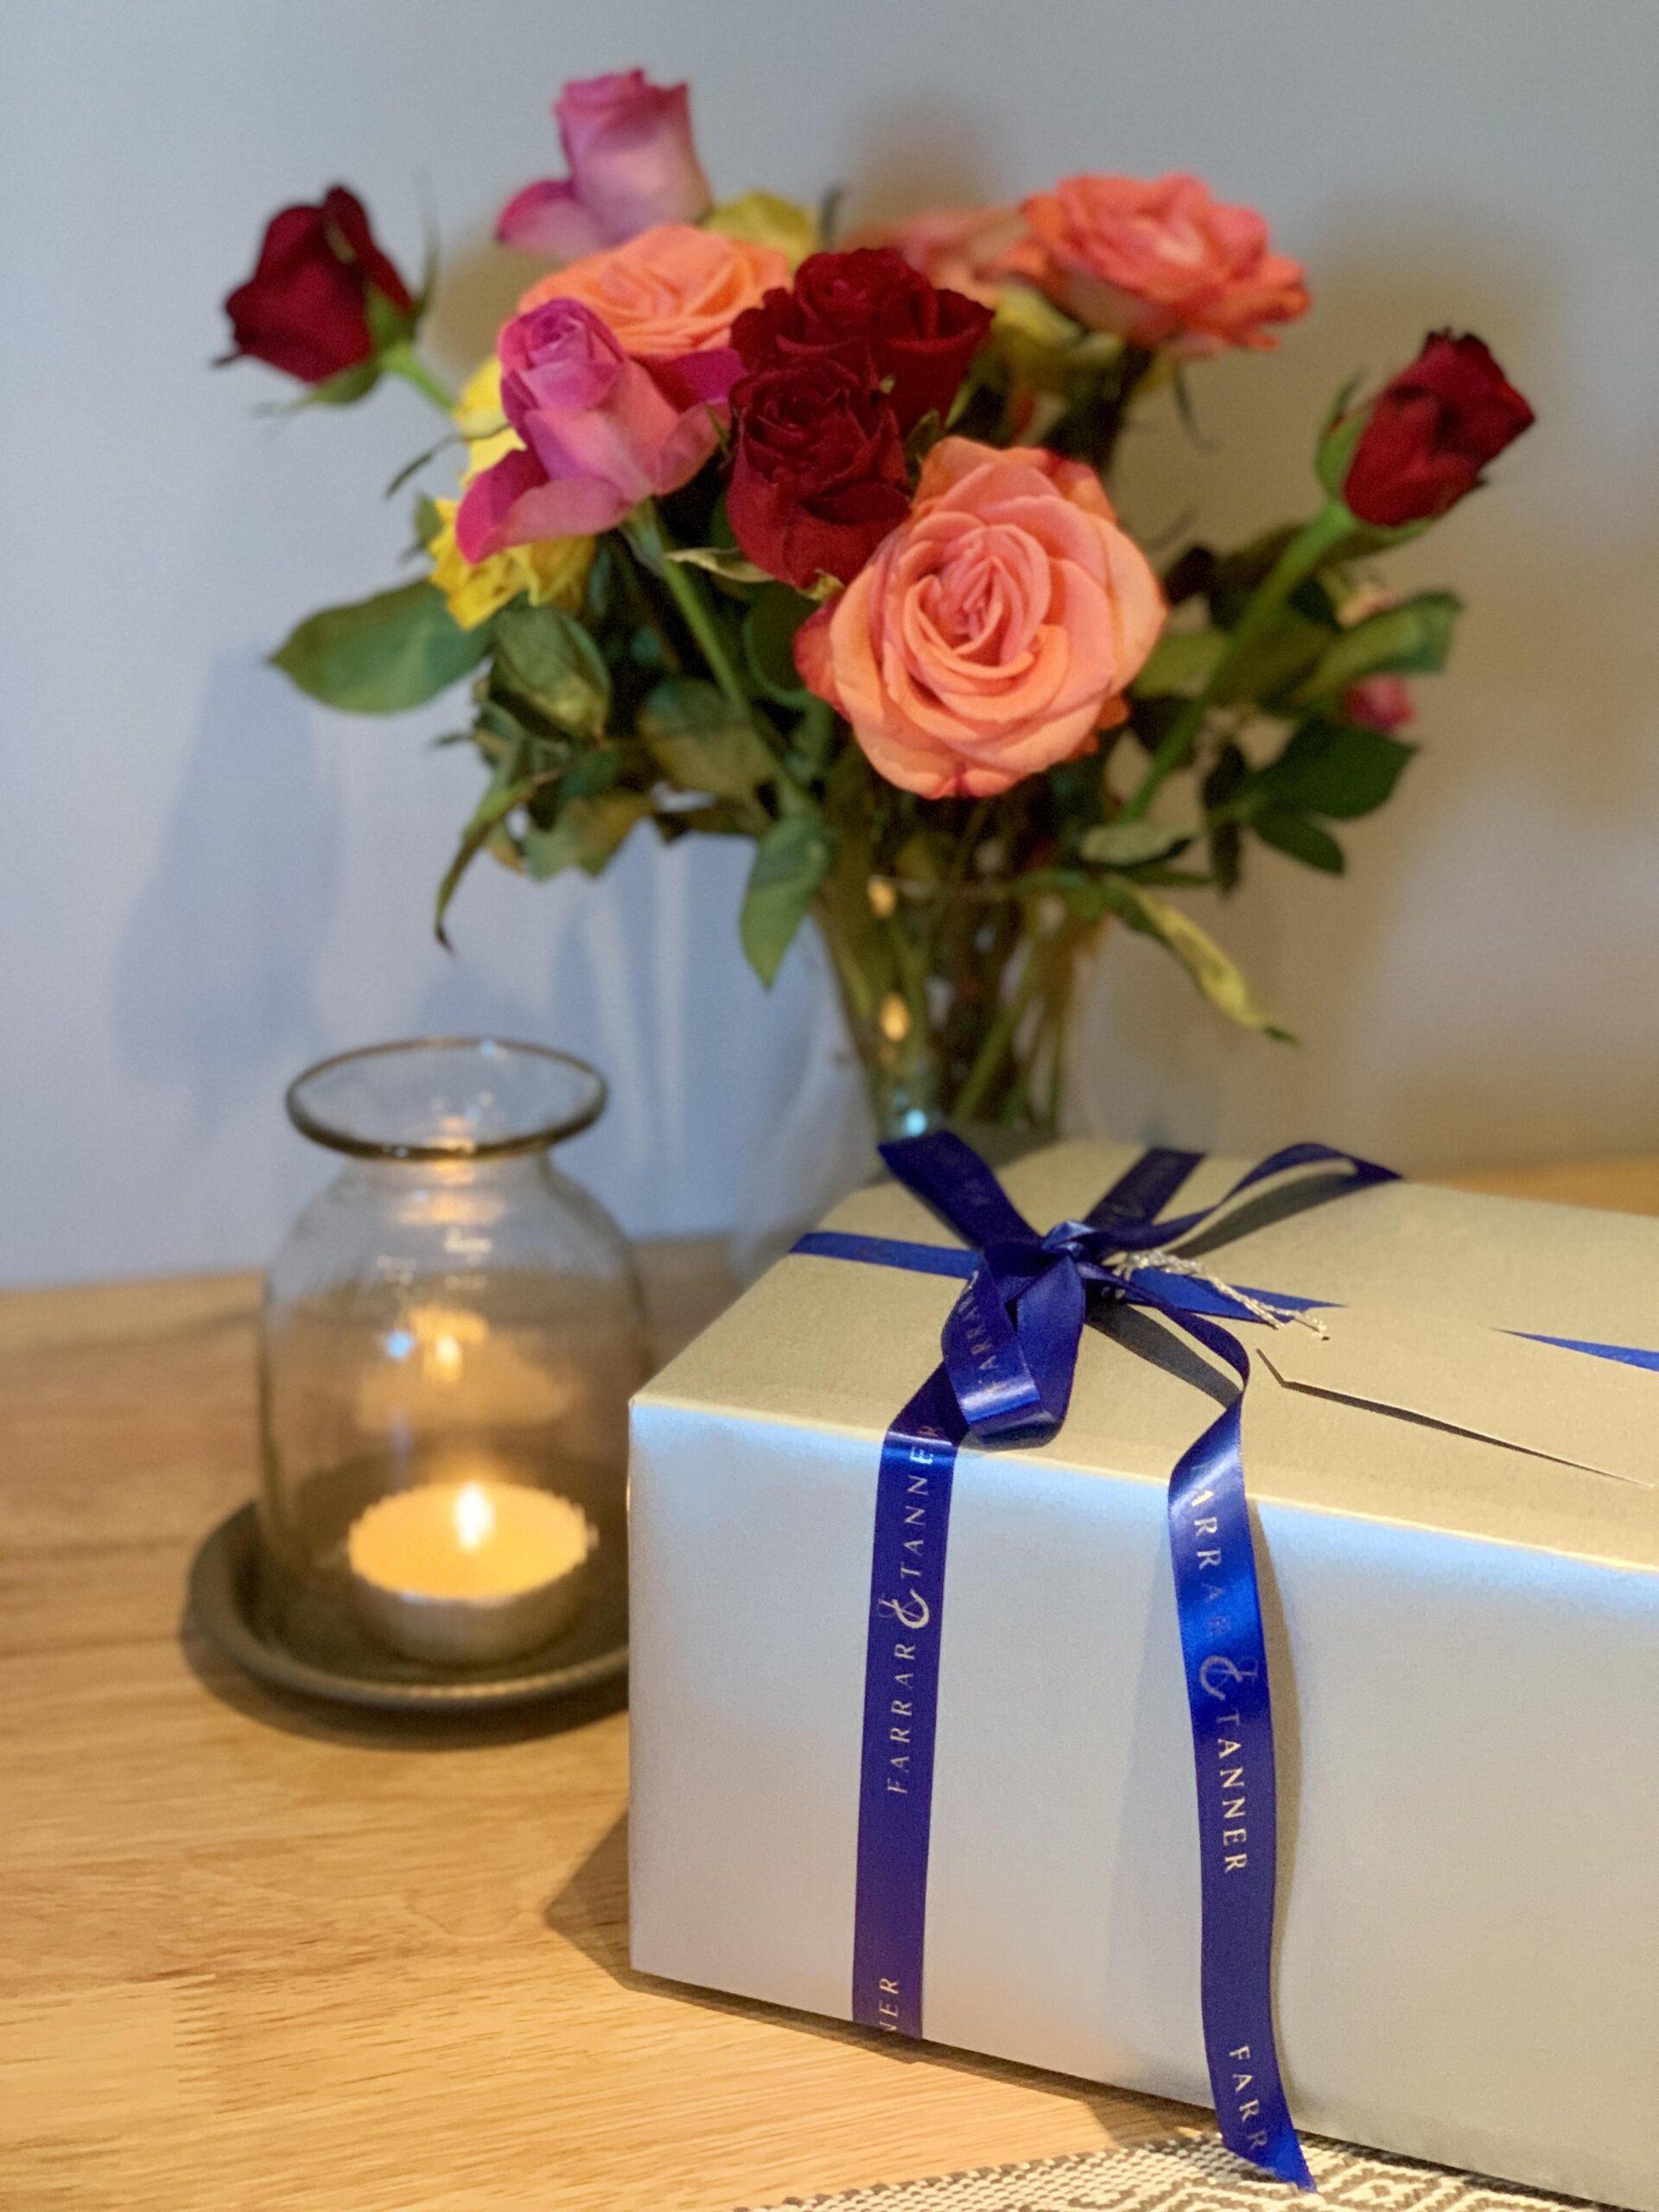 Farrar and Tanner gift wrap